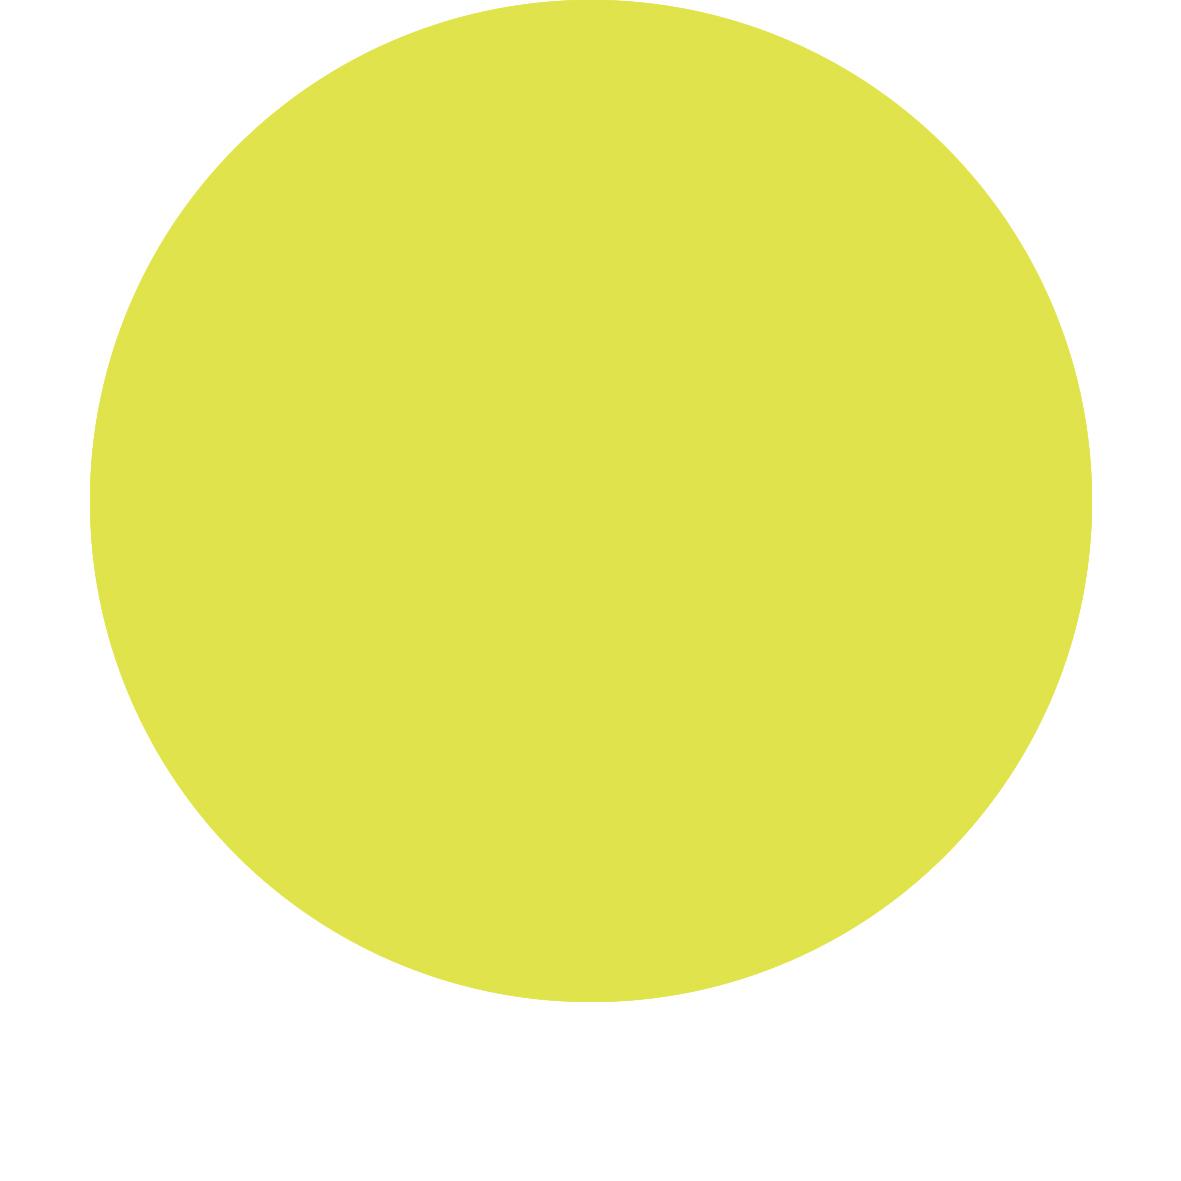 C.I. Yellow 3(MOL1030) -